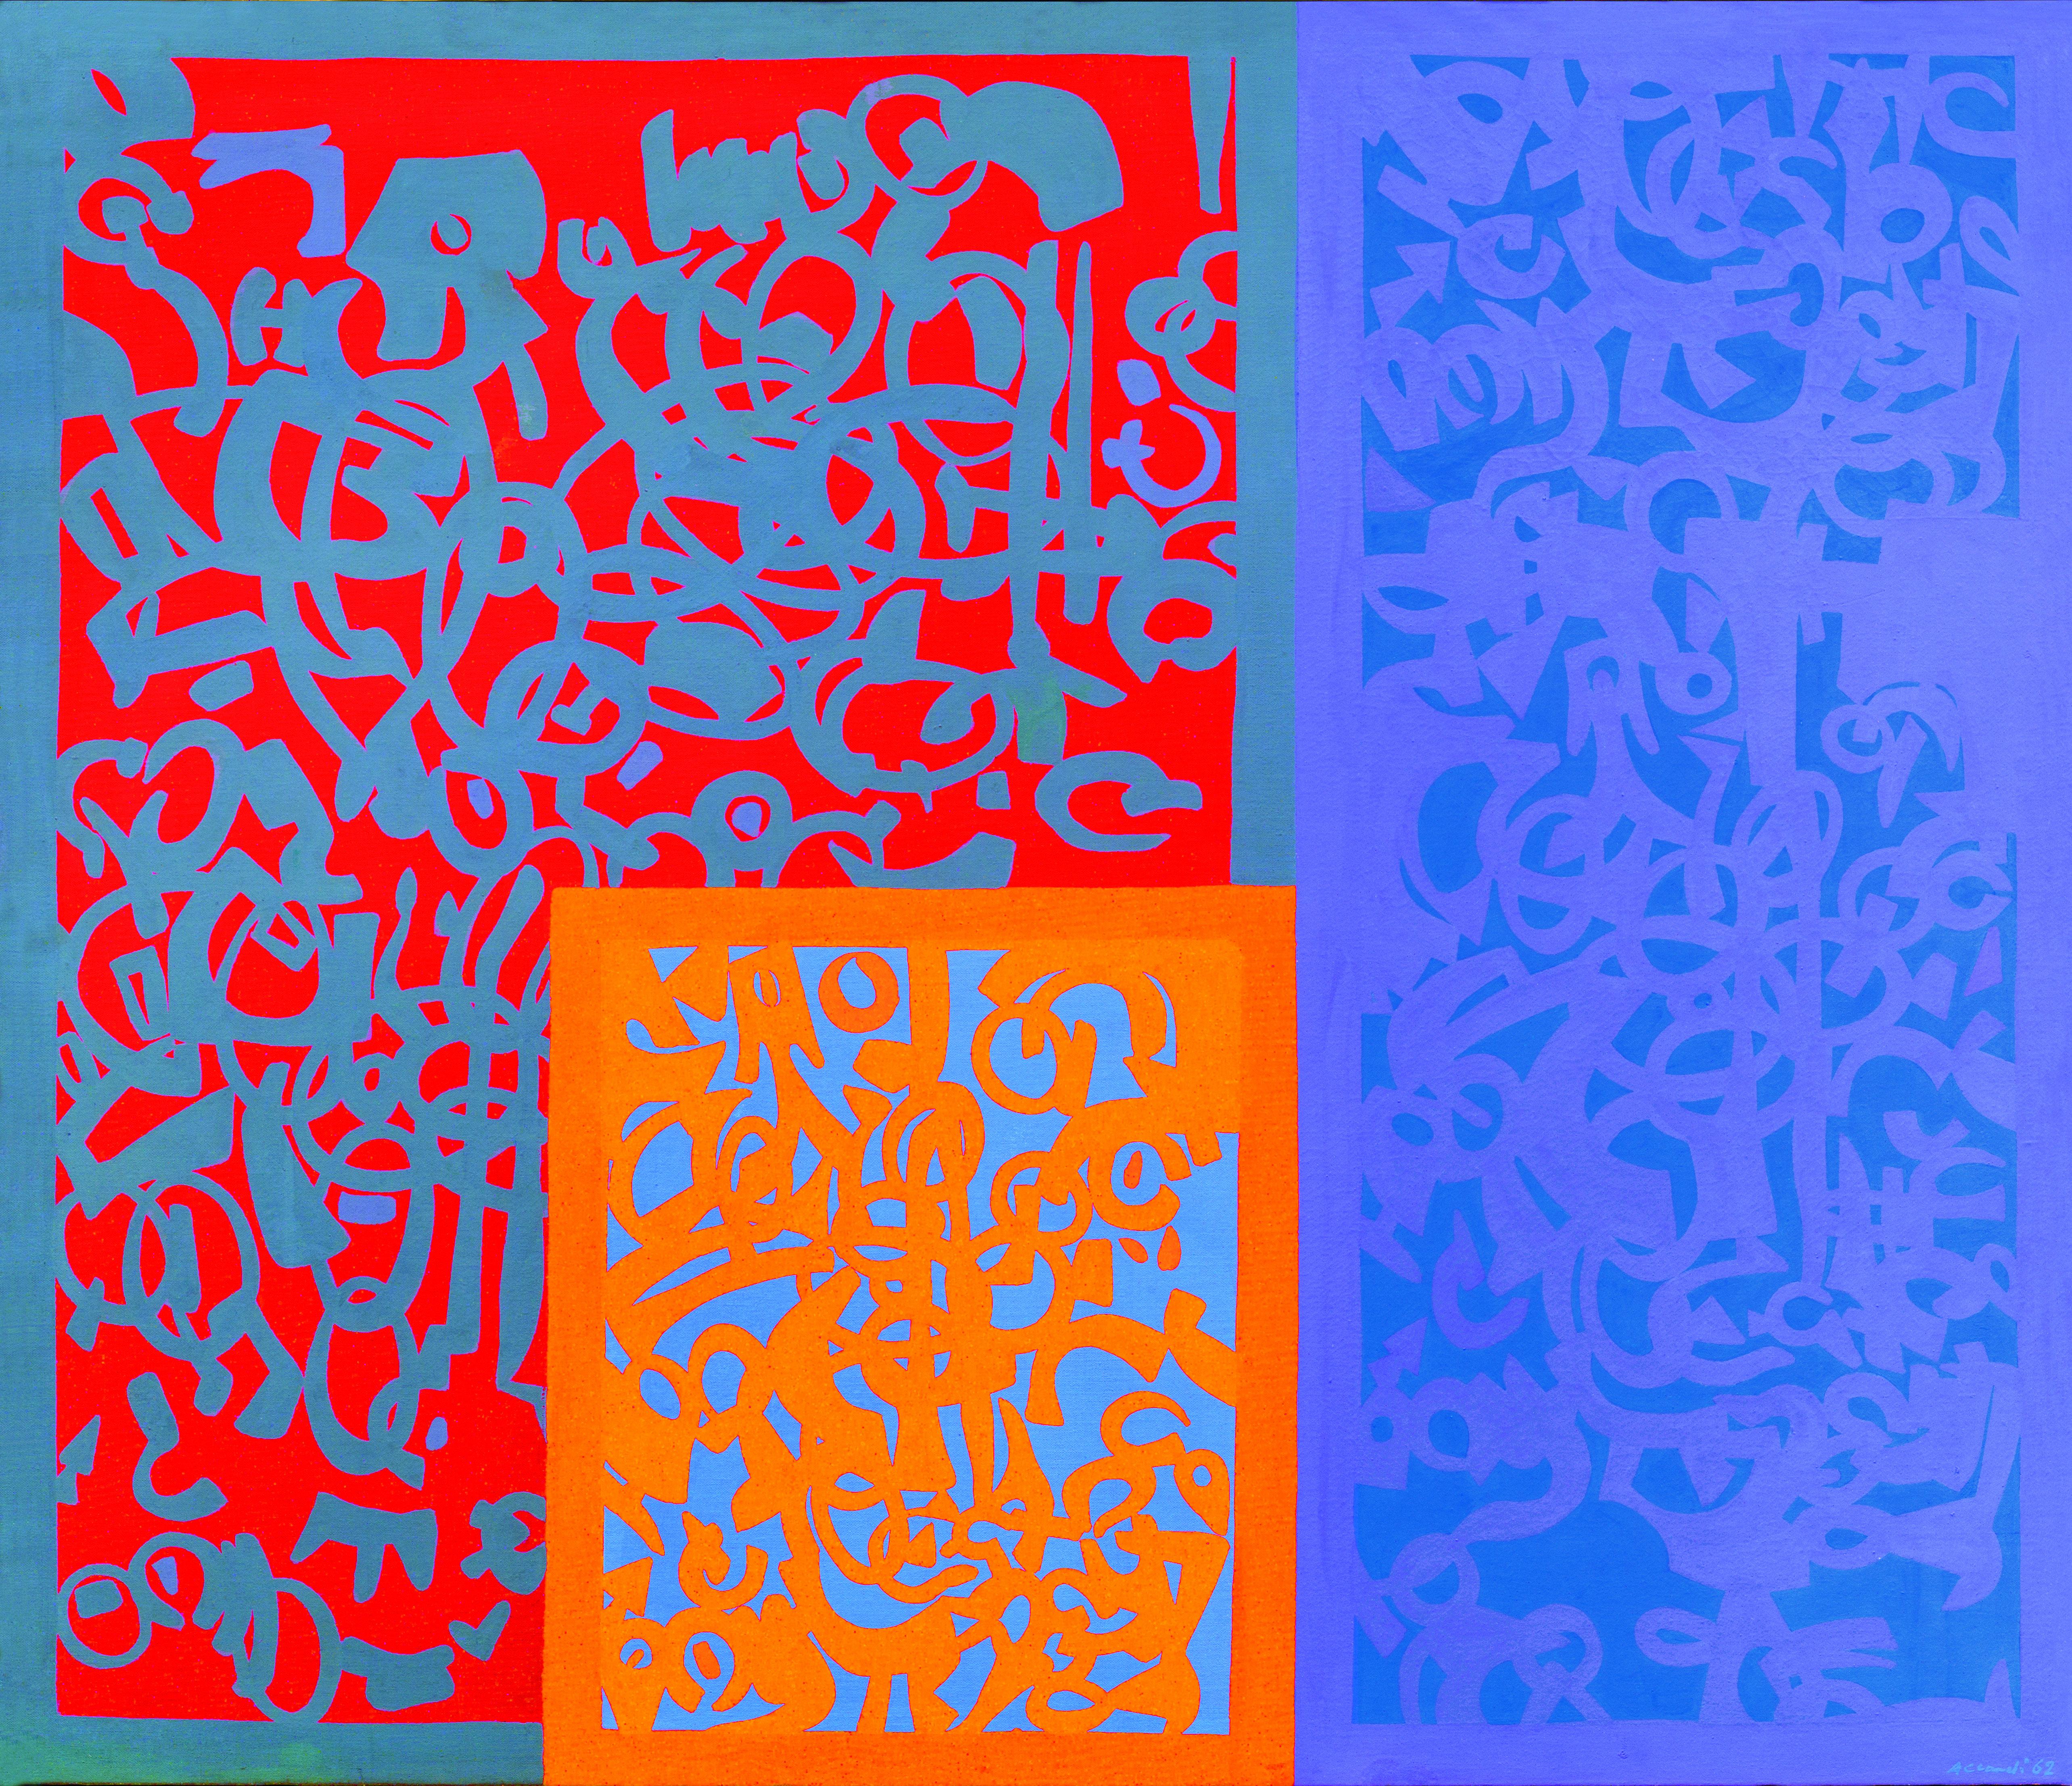 Carla Accardi A Settori, 1962 Kasein auf Leinwand, 120 x 140 cm erzielter Preis € 112.500